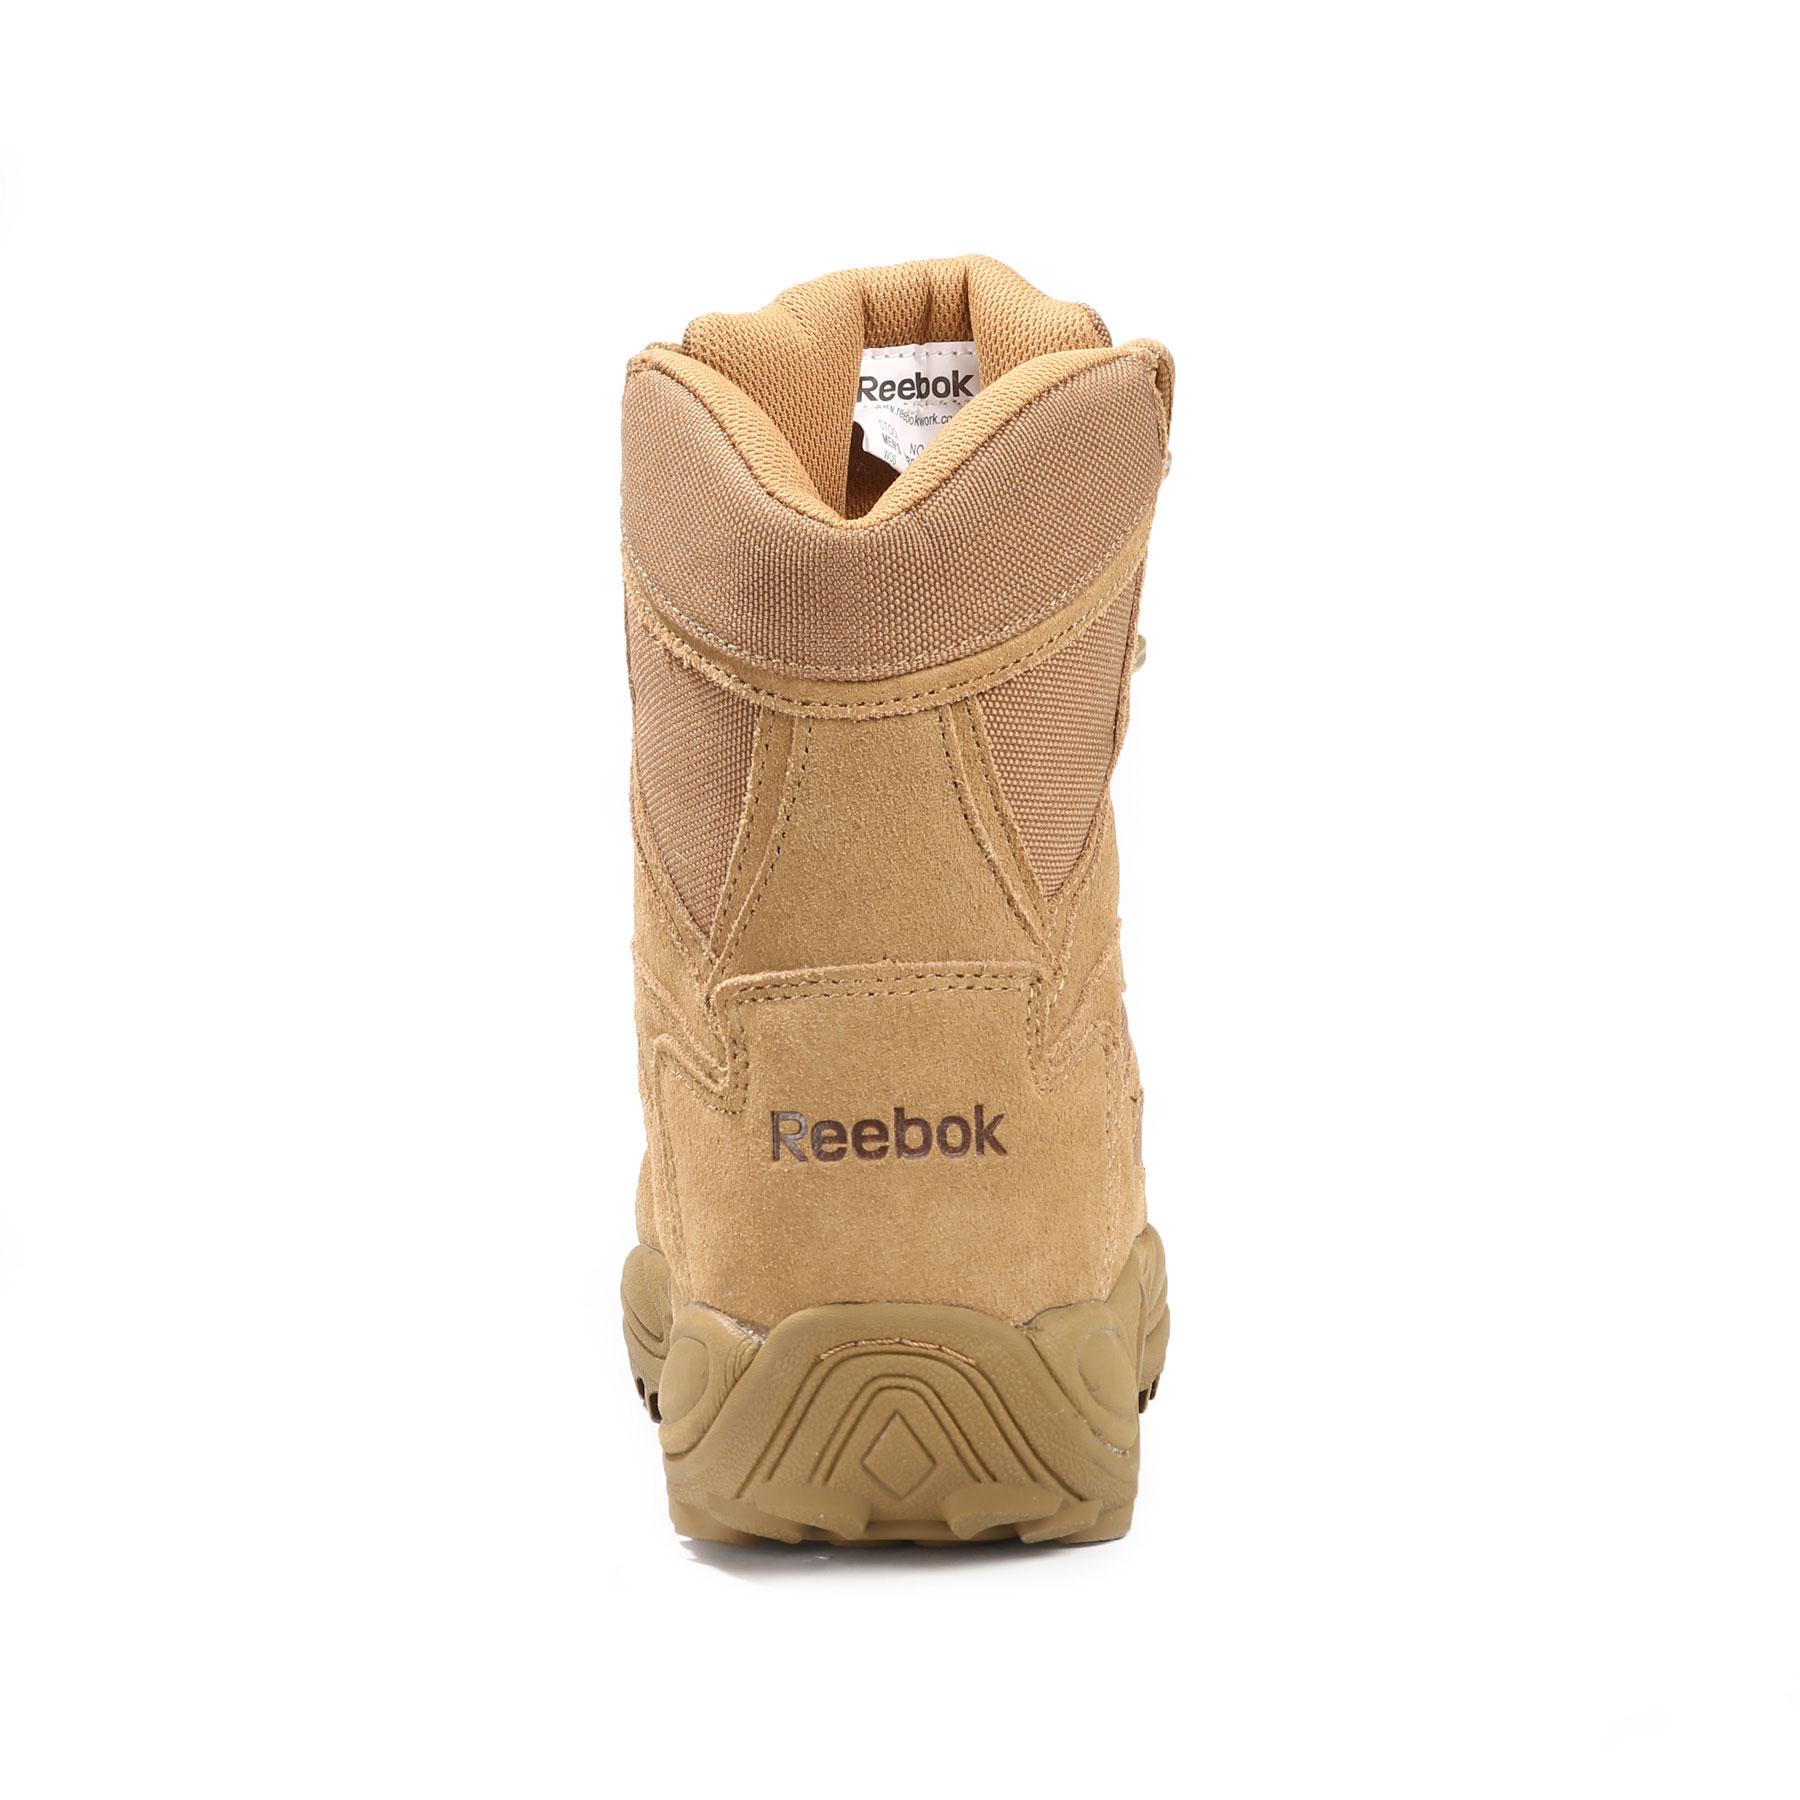 ad37def0afe Reebok Rapid Response RB 8